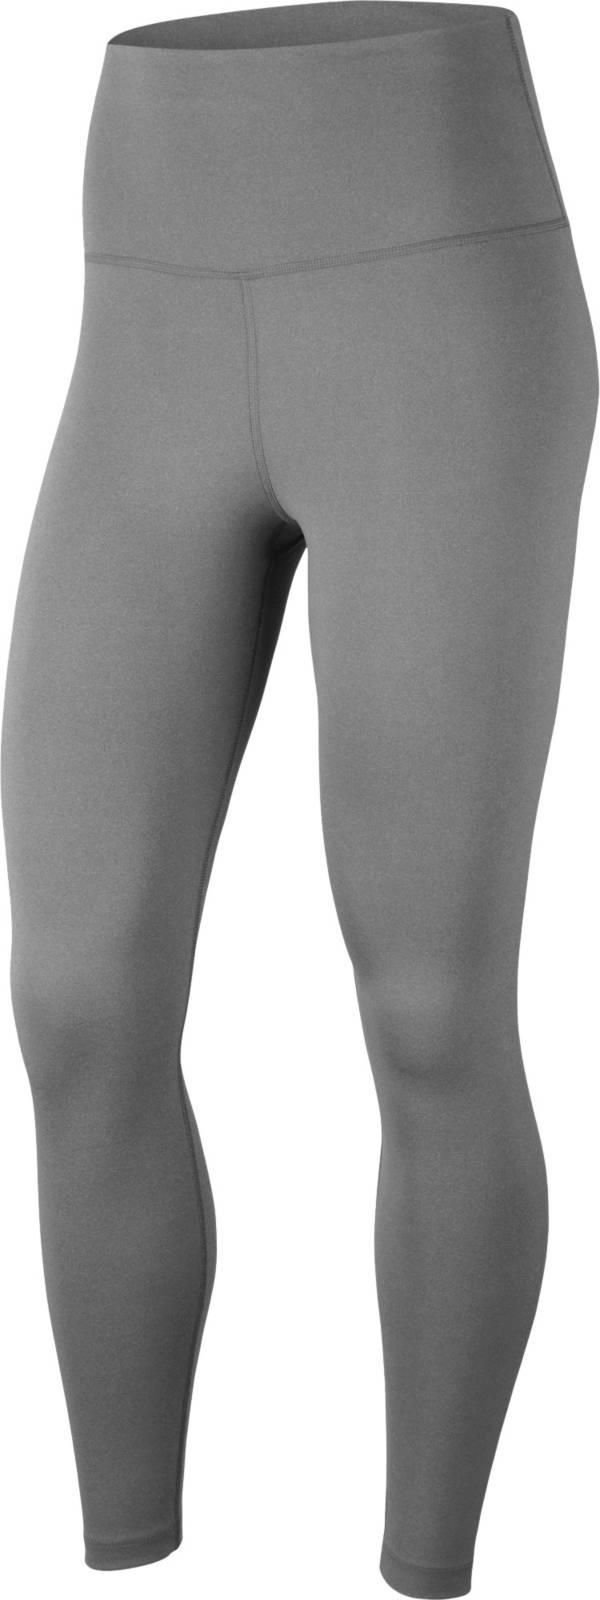 Nike Women's 7/8 Yoga Tights product image